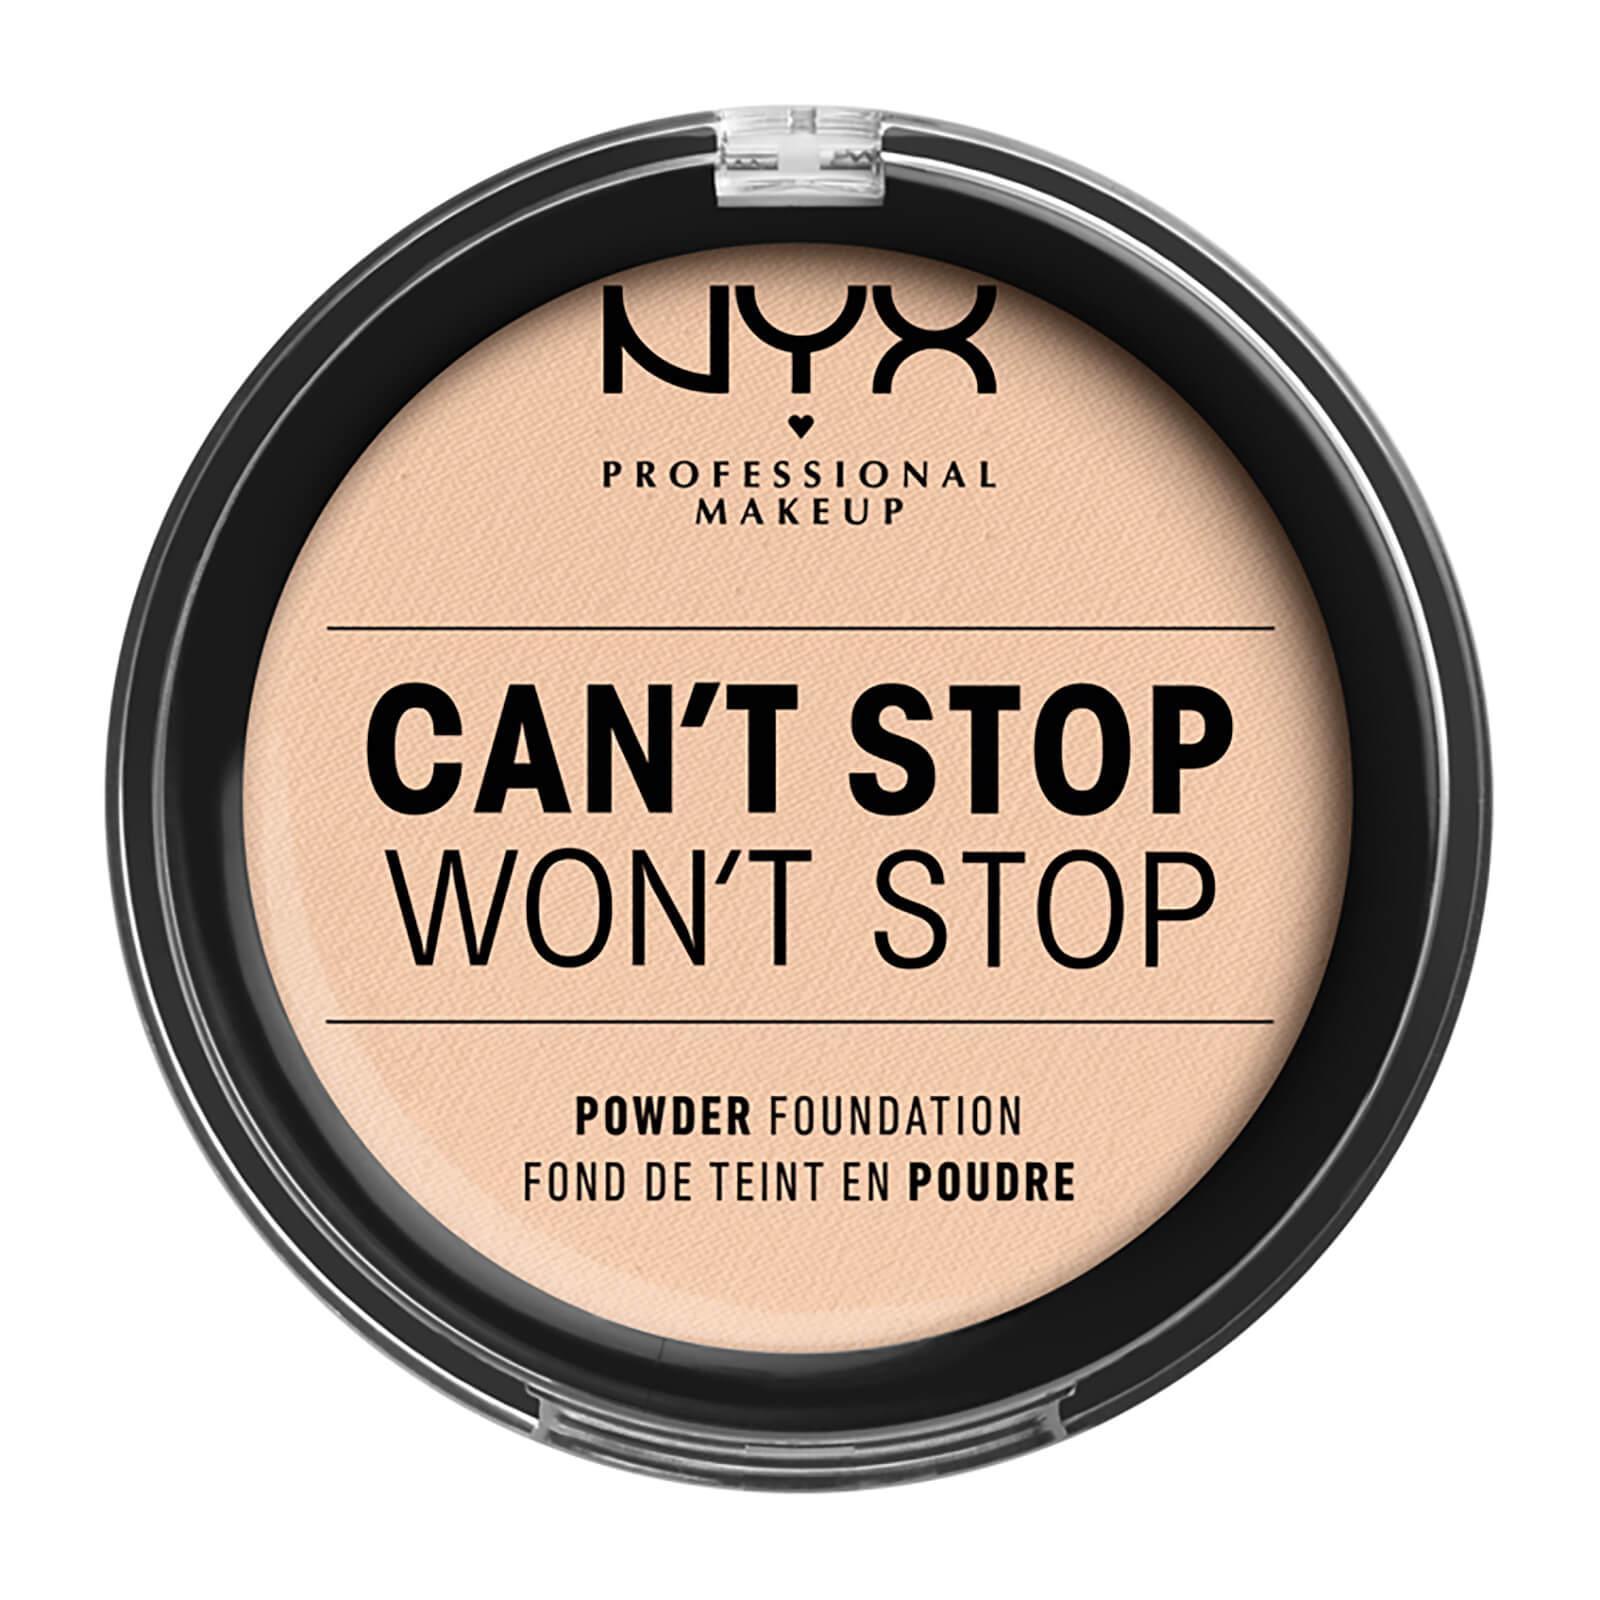 Купить NYX Professional Makeup Can't Stop Won't Stop Powder Foundation (Various Shades) - Light Ivory